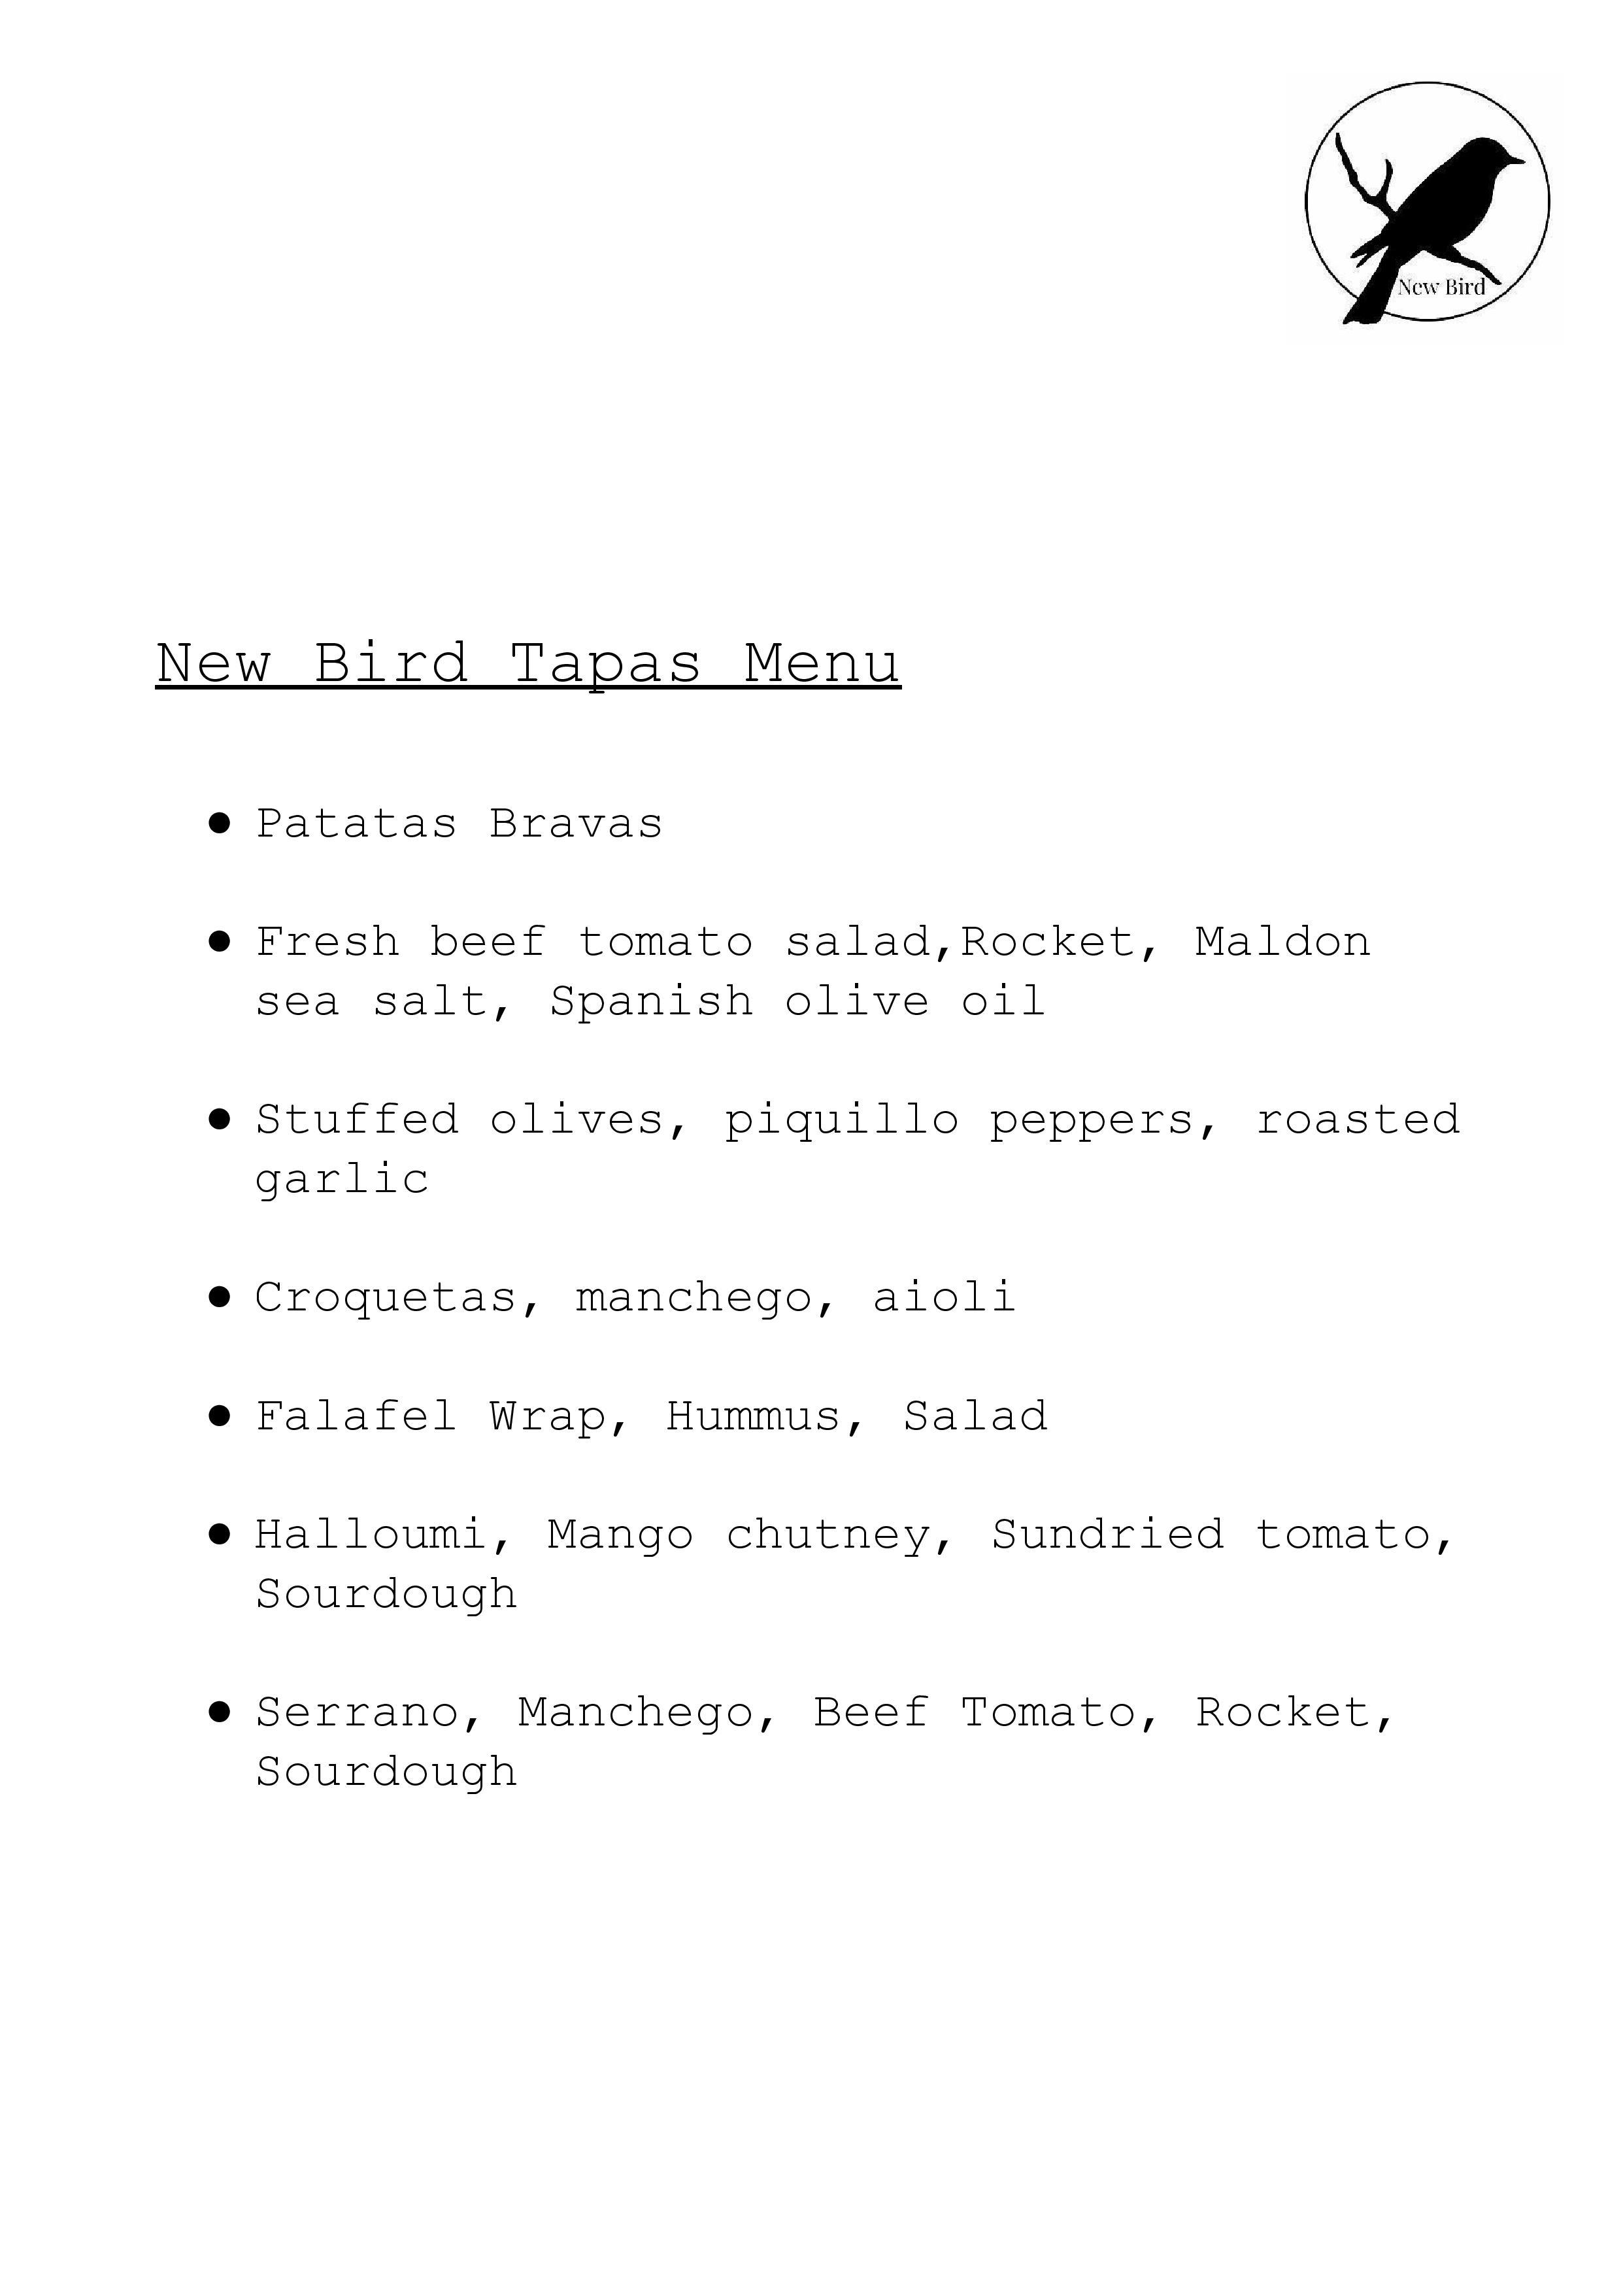 New bird tapas.odt-page-001.jpg